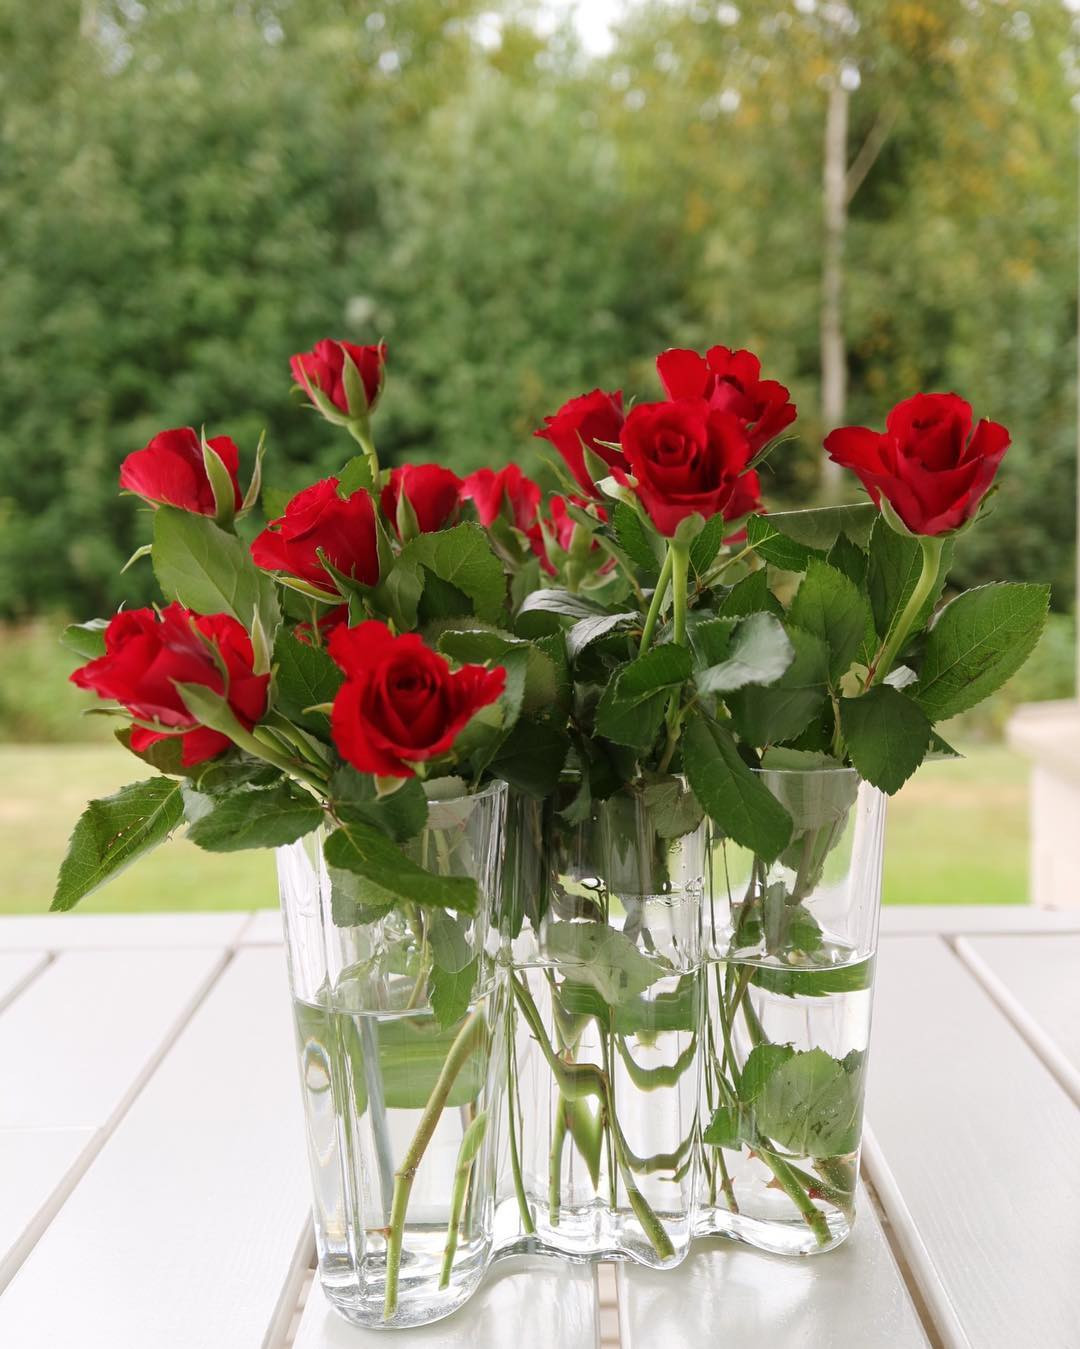 alvar aalto finlandia vase of savoyvase hash tags deskgram throughout kipasin kaupasta hakemassa na¤ma¤ tuulessa tanssivat ruusut dŸŒ¬ dŸŒdŸŒ¹dŸ˜ niin kaunis pa¤iva¤ ta¤na¤a